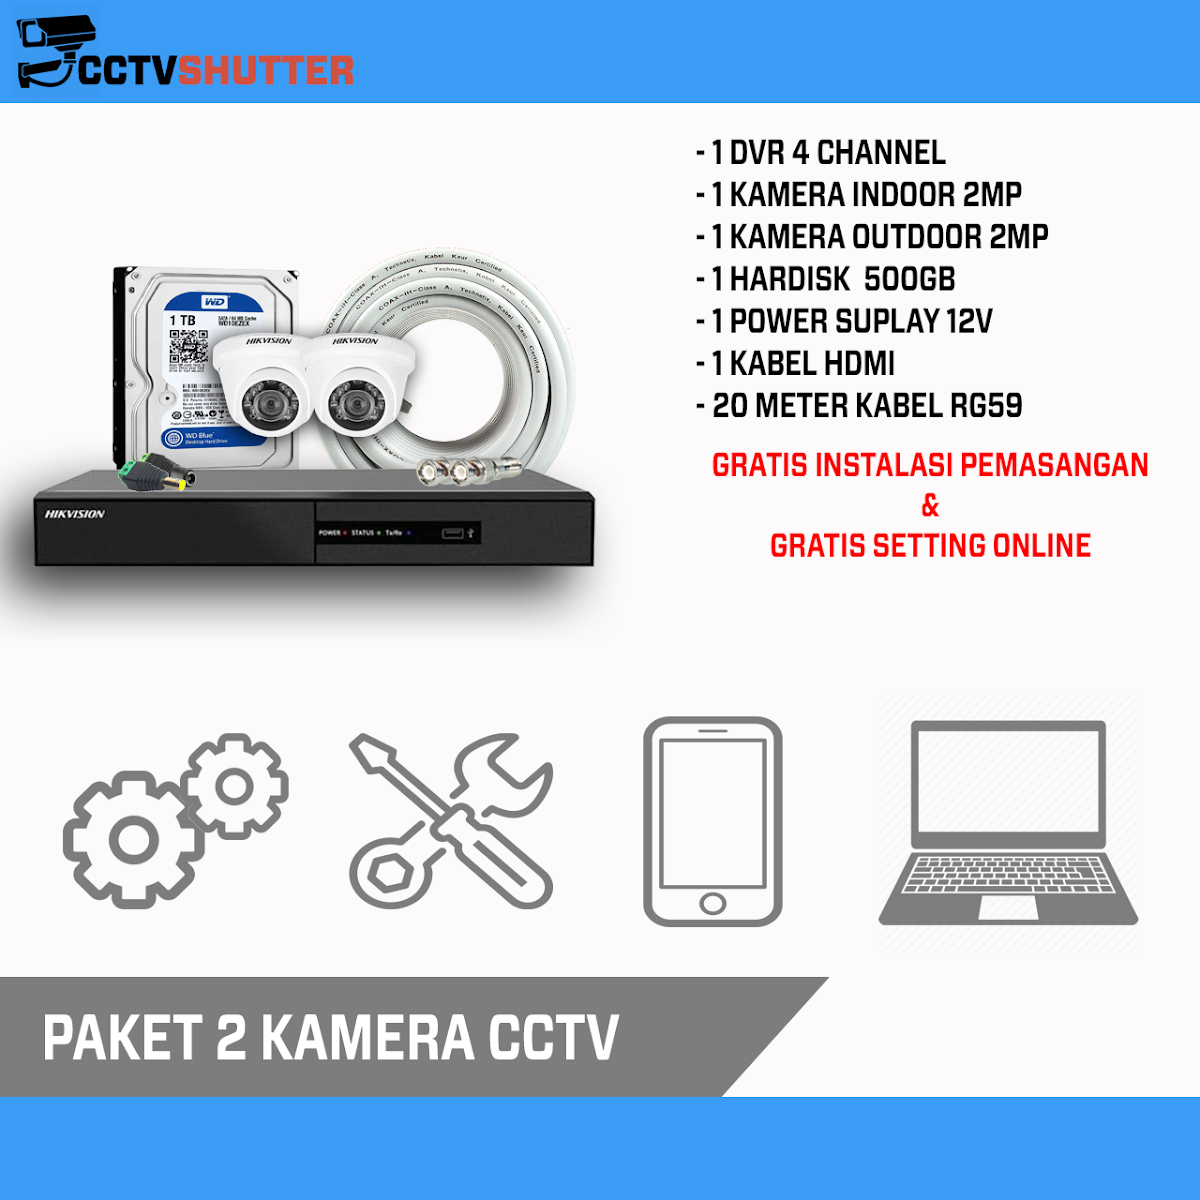 PASANG 6 KAMERA 2MP CCTV ONLINE MURAH